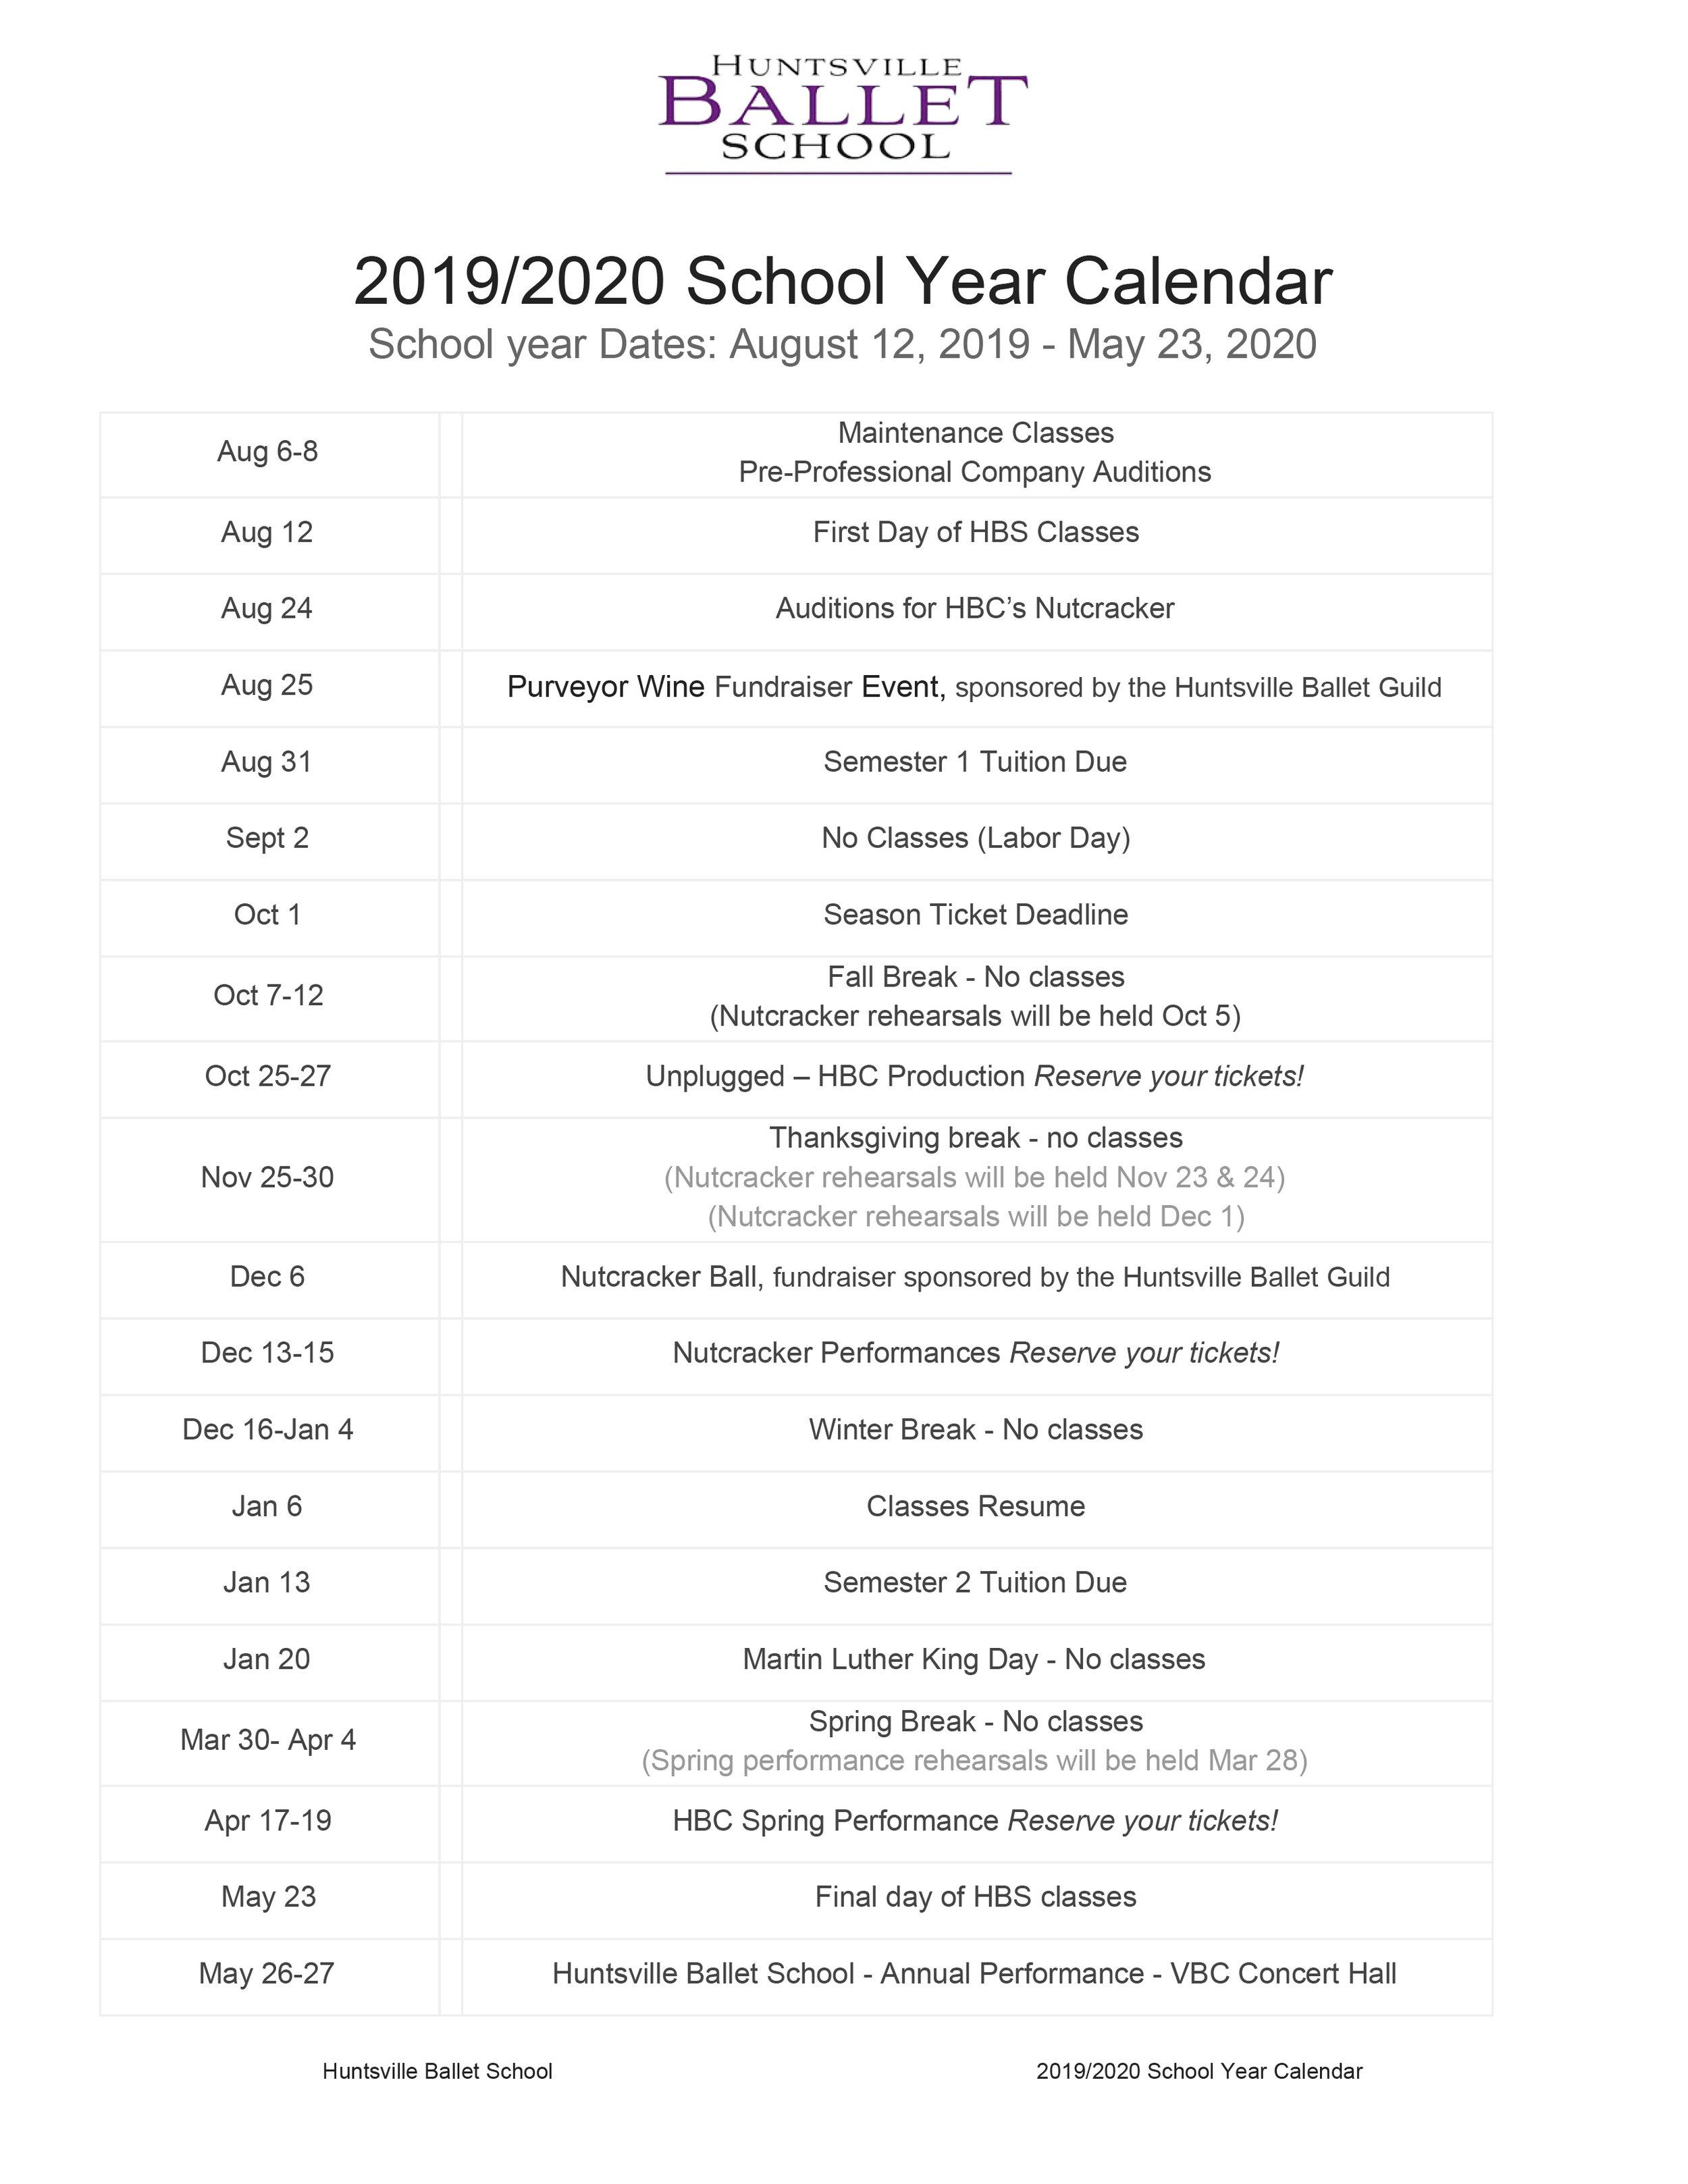 2019-2020 HBS Calendar.jpg